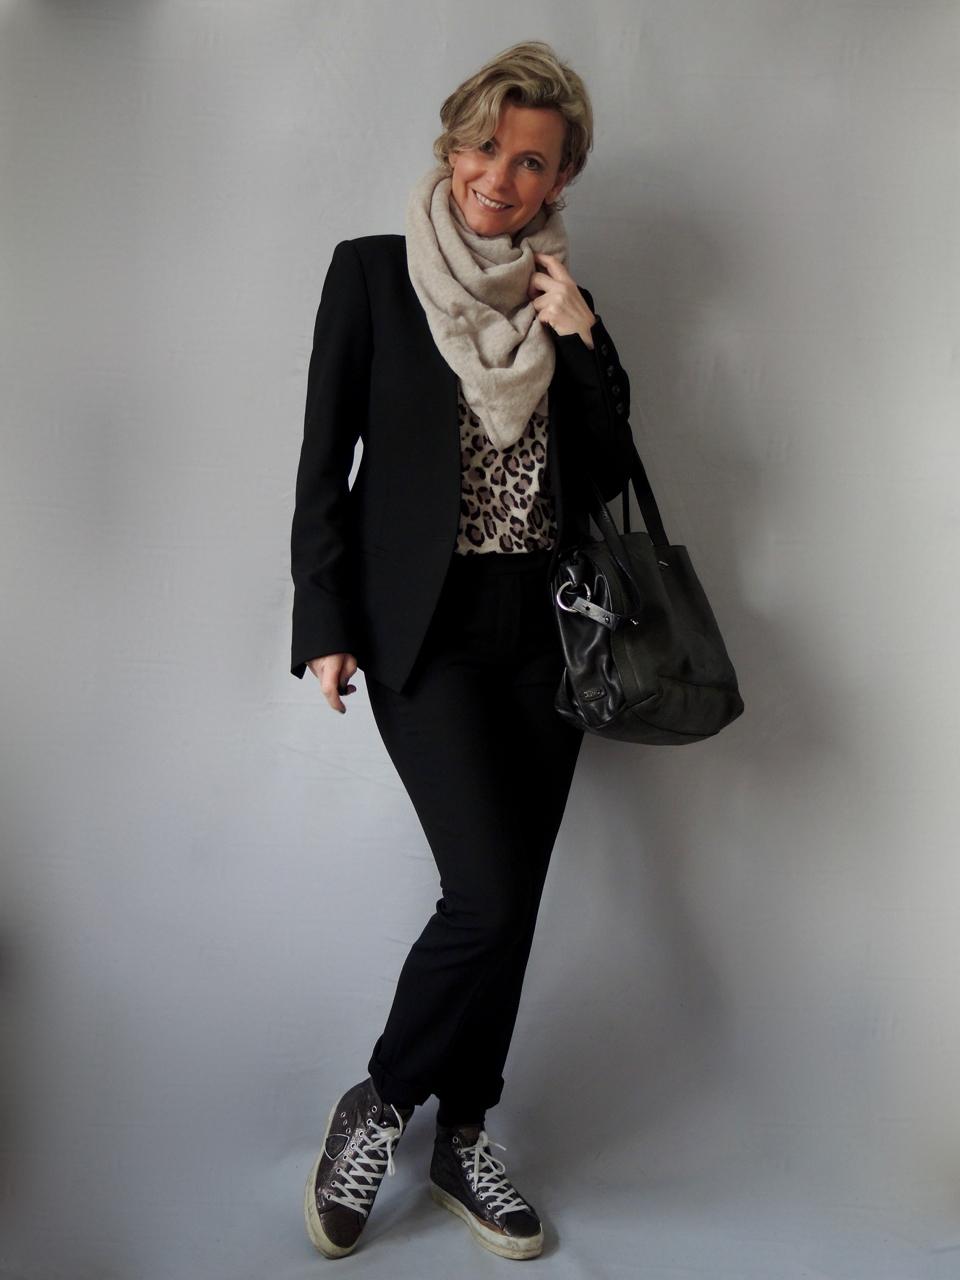 leoshirt women2style. Black Bedroom Furniture Sets. Home Design Ideas